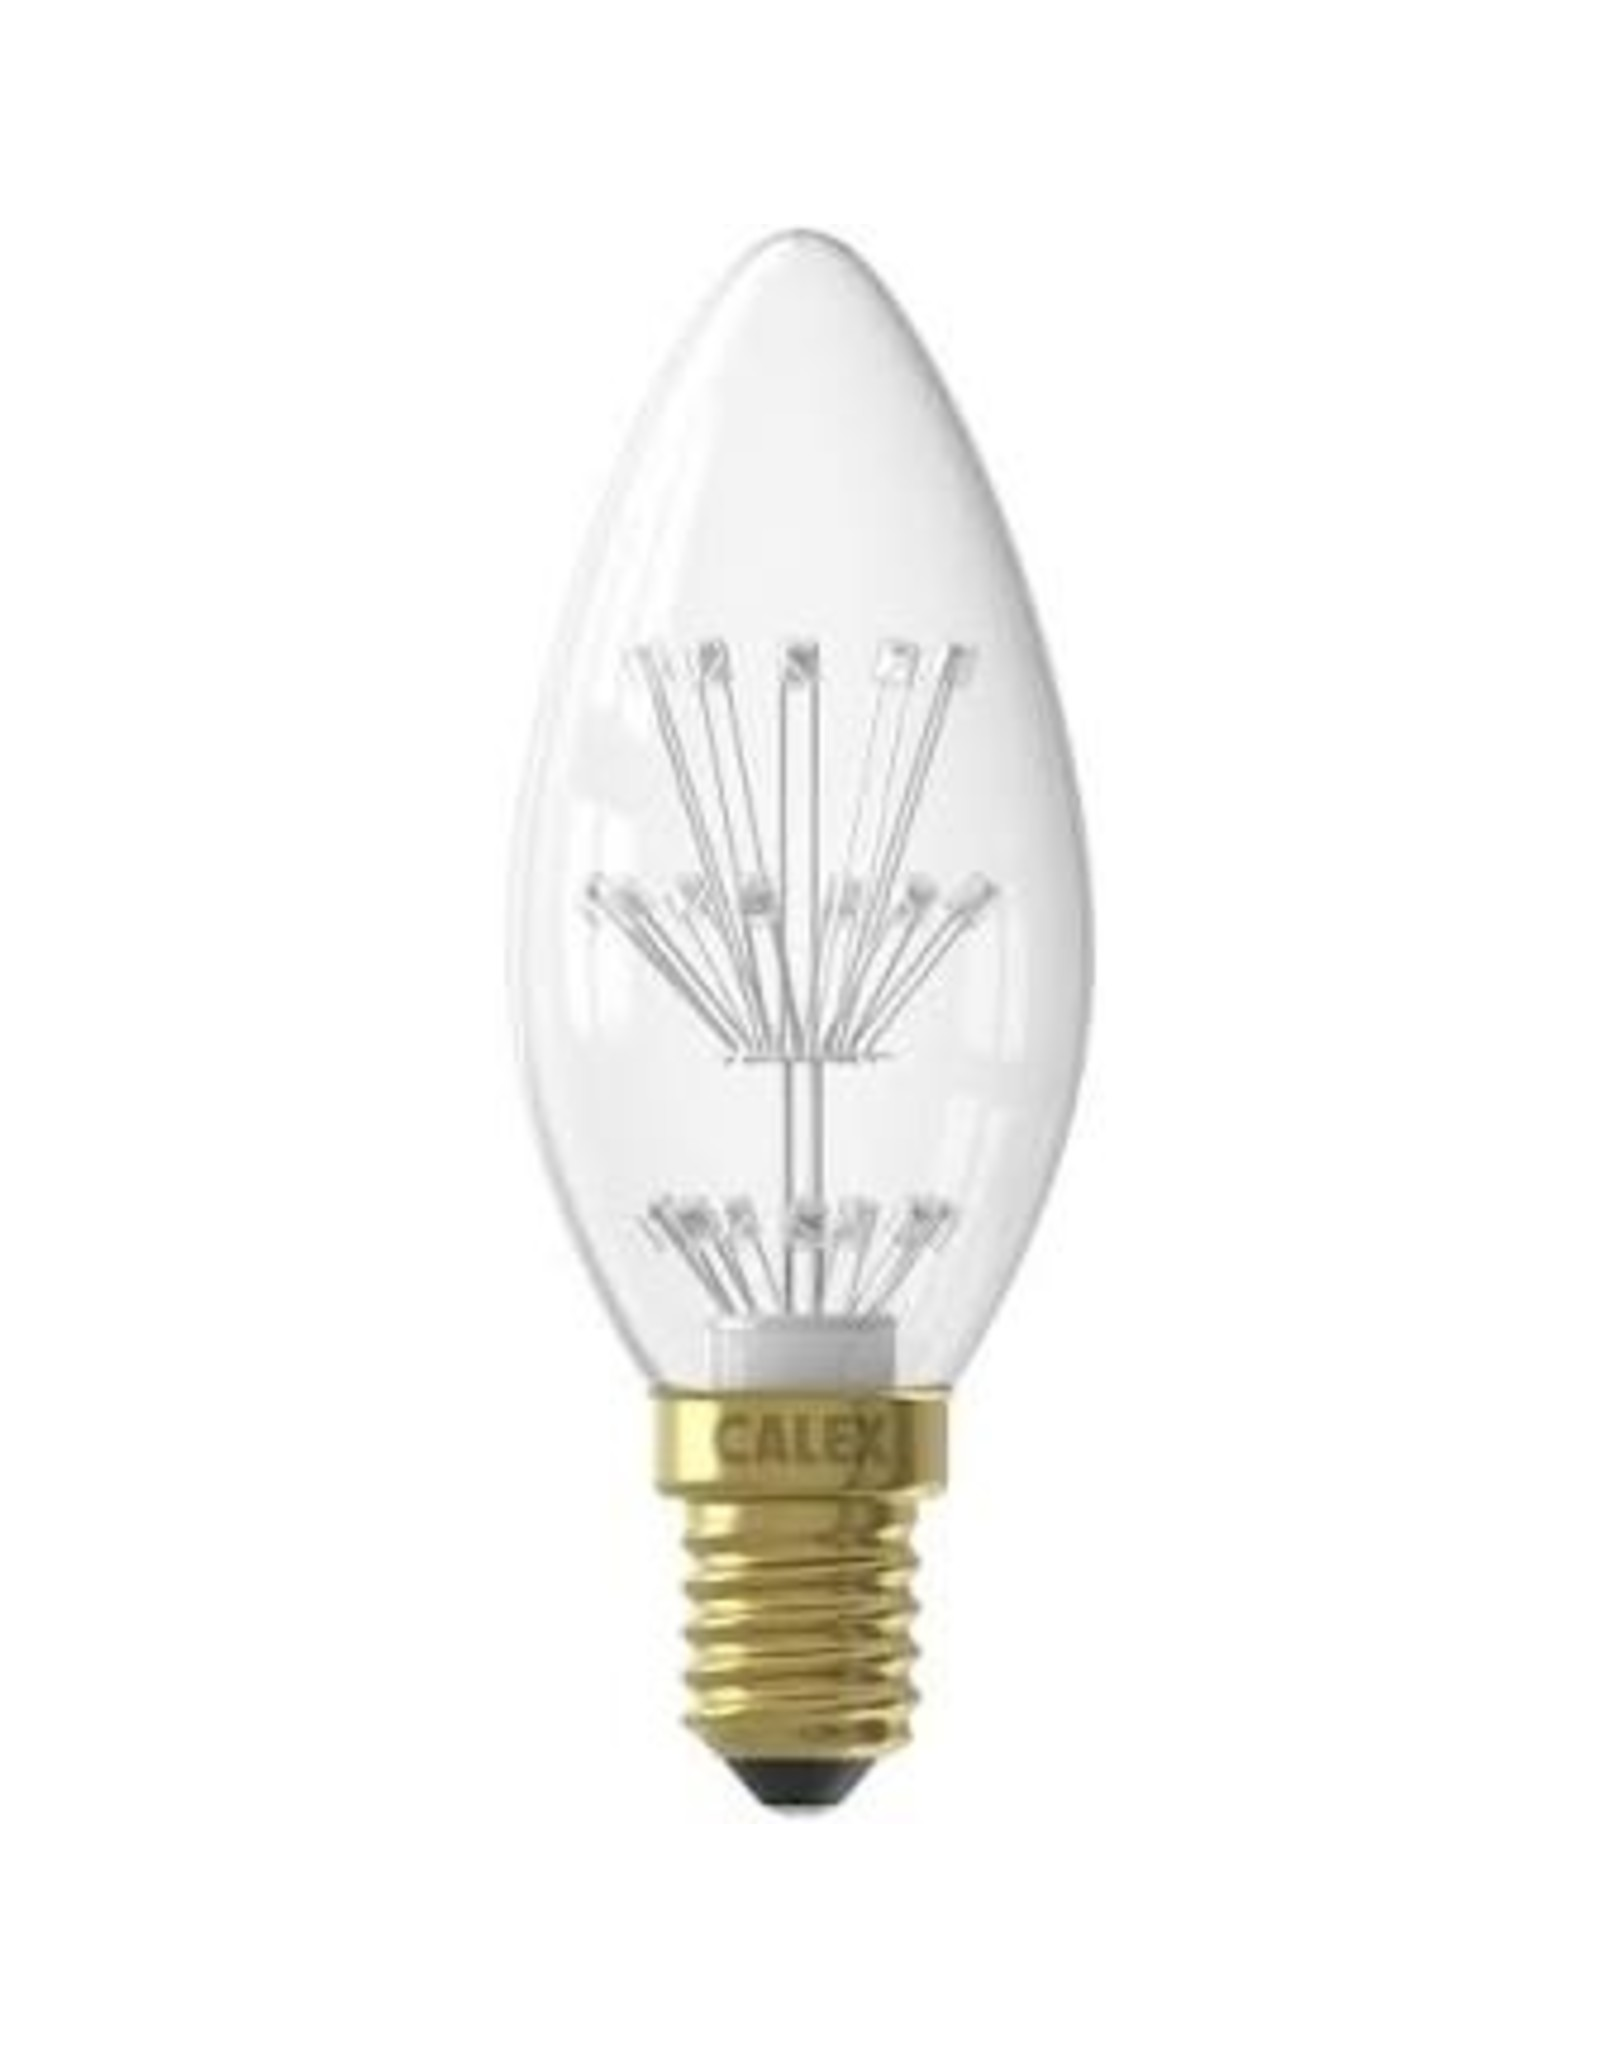 Calex Pearl LED Candle lamp 220-240V 1,0W E14 B35, 20-leds 2100K, energy label A++